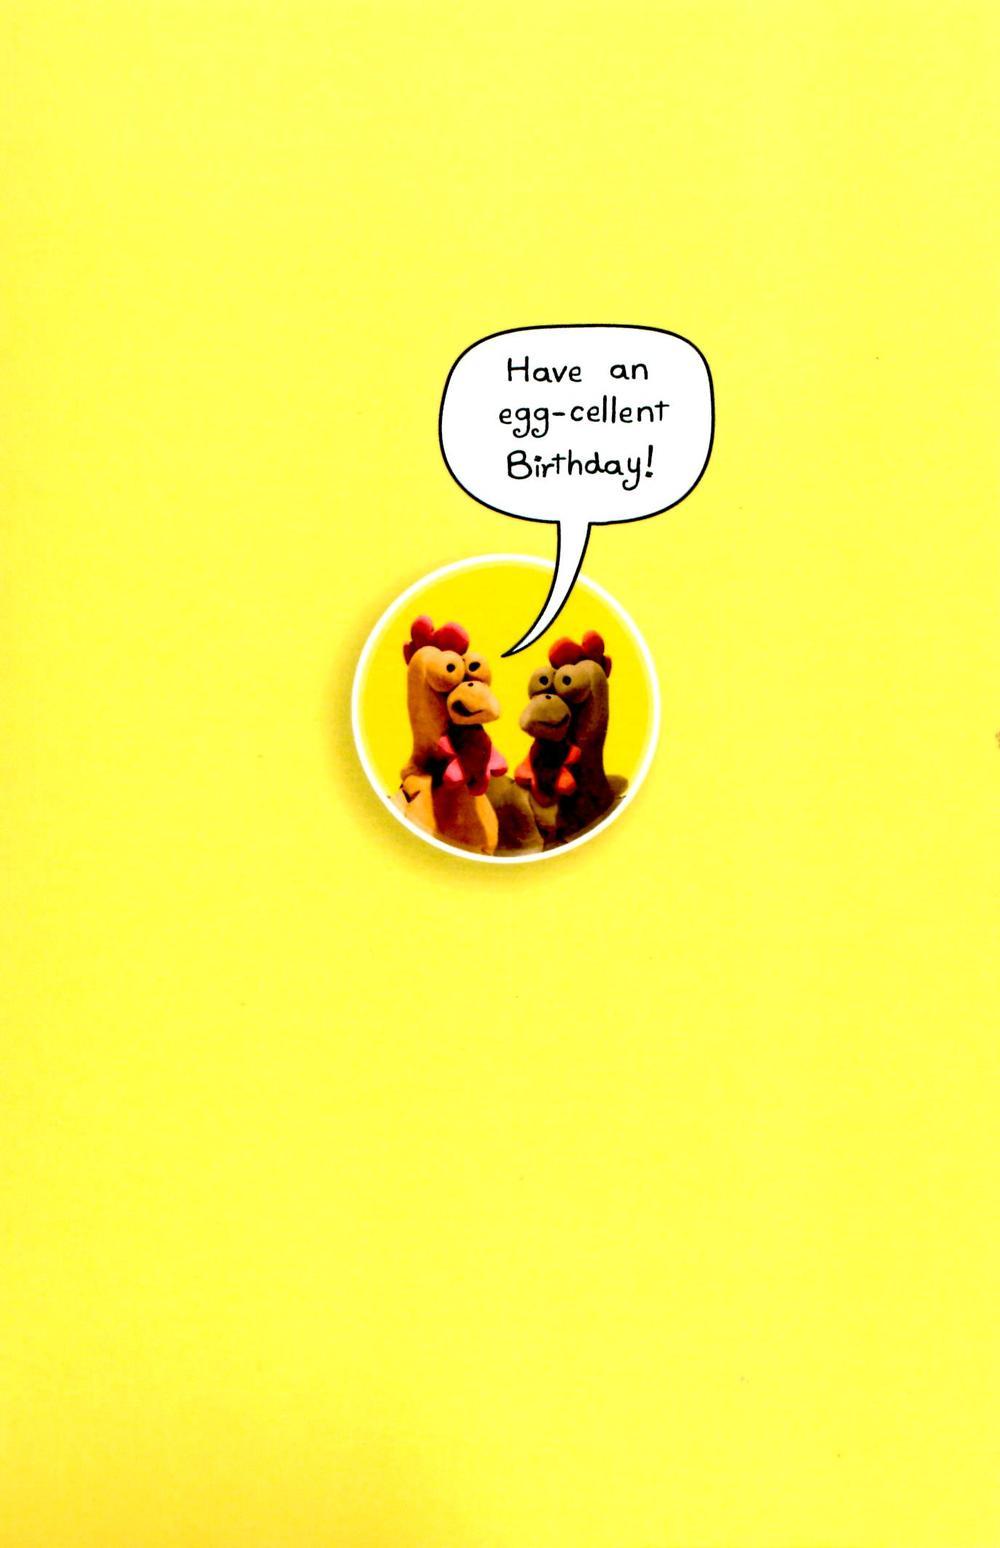 funny sneezing chicken birthday card